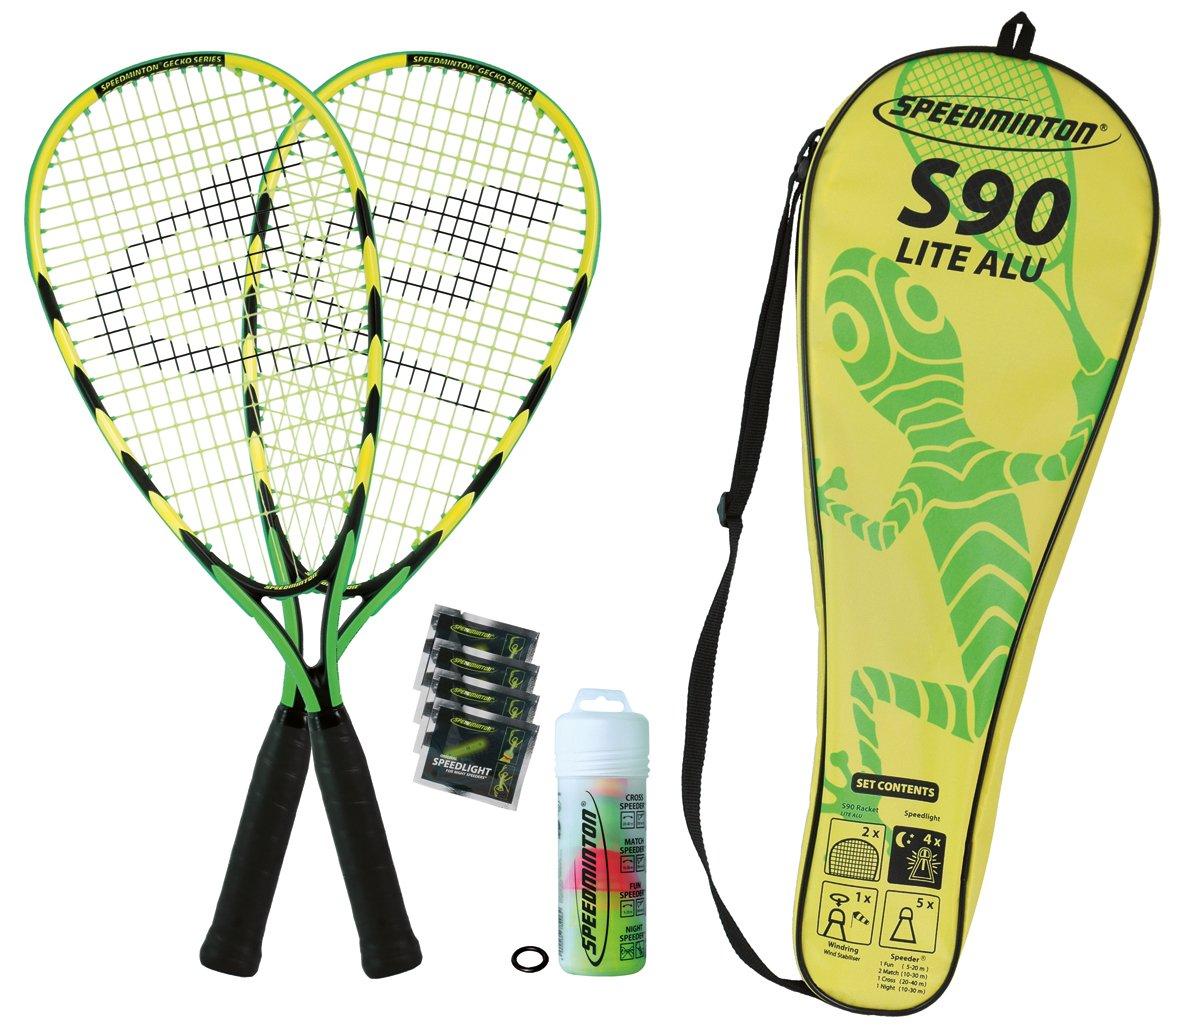 Speedminton Badmintonschläger Set S90 in Fulllcover, Keine Farbe 400077